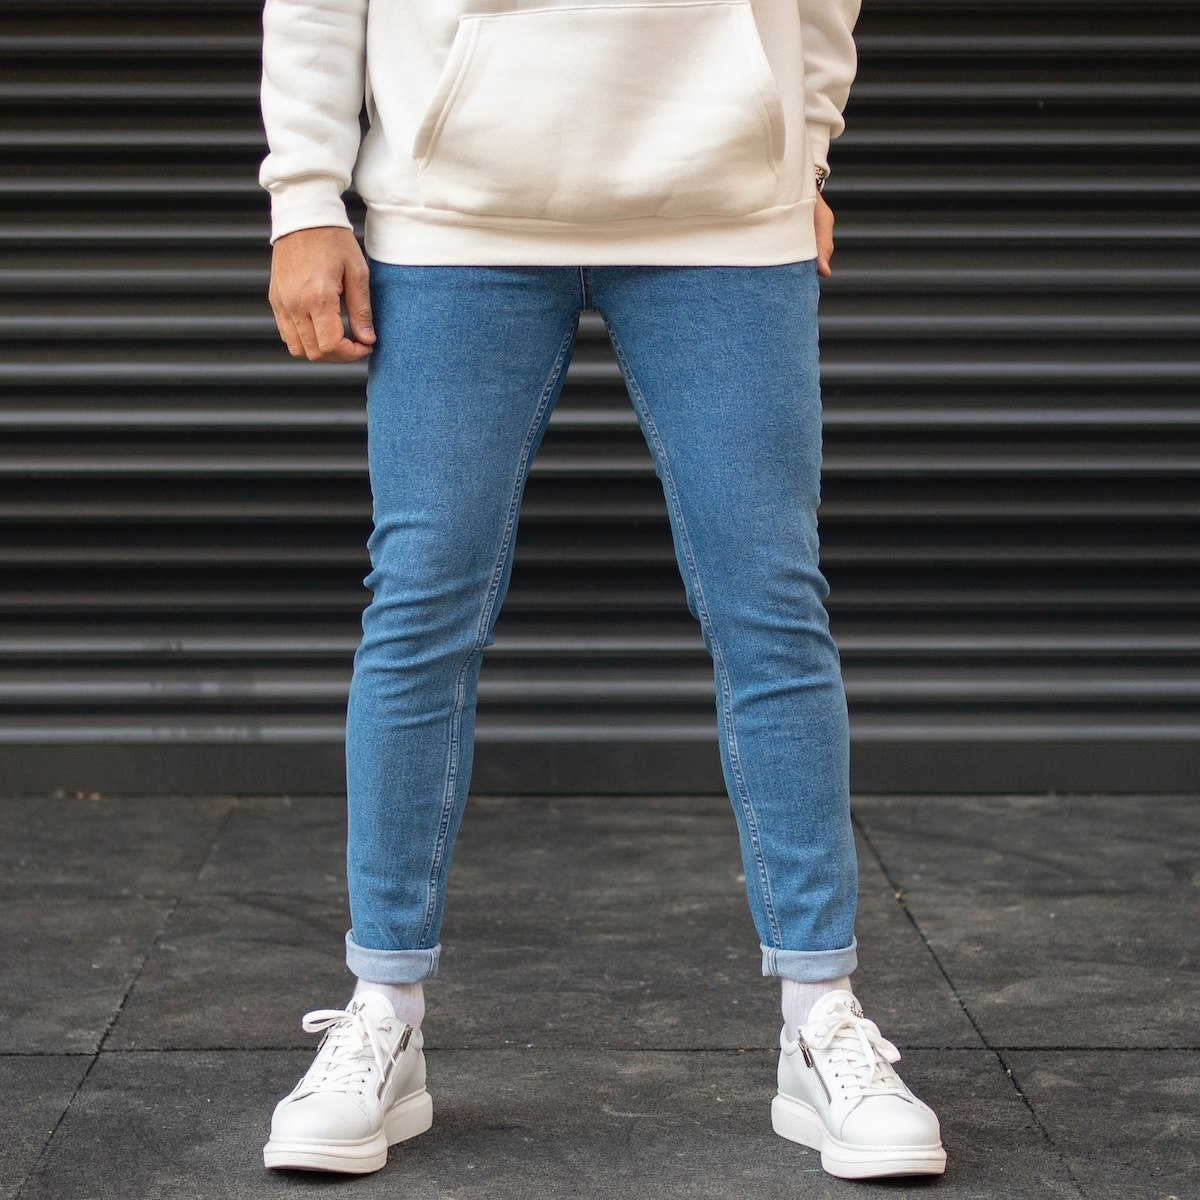 Men's Slim Fit Skinny Leg Jeans In Blue